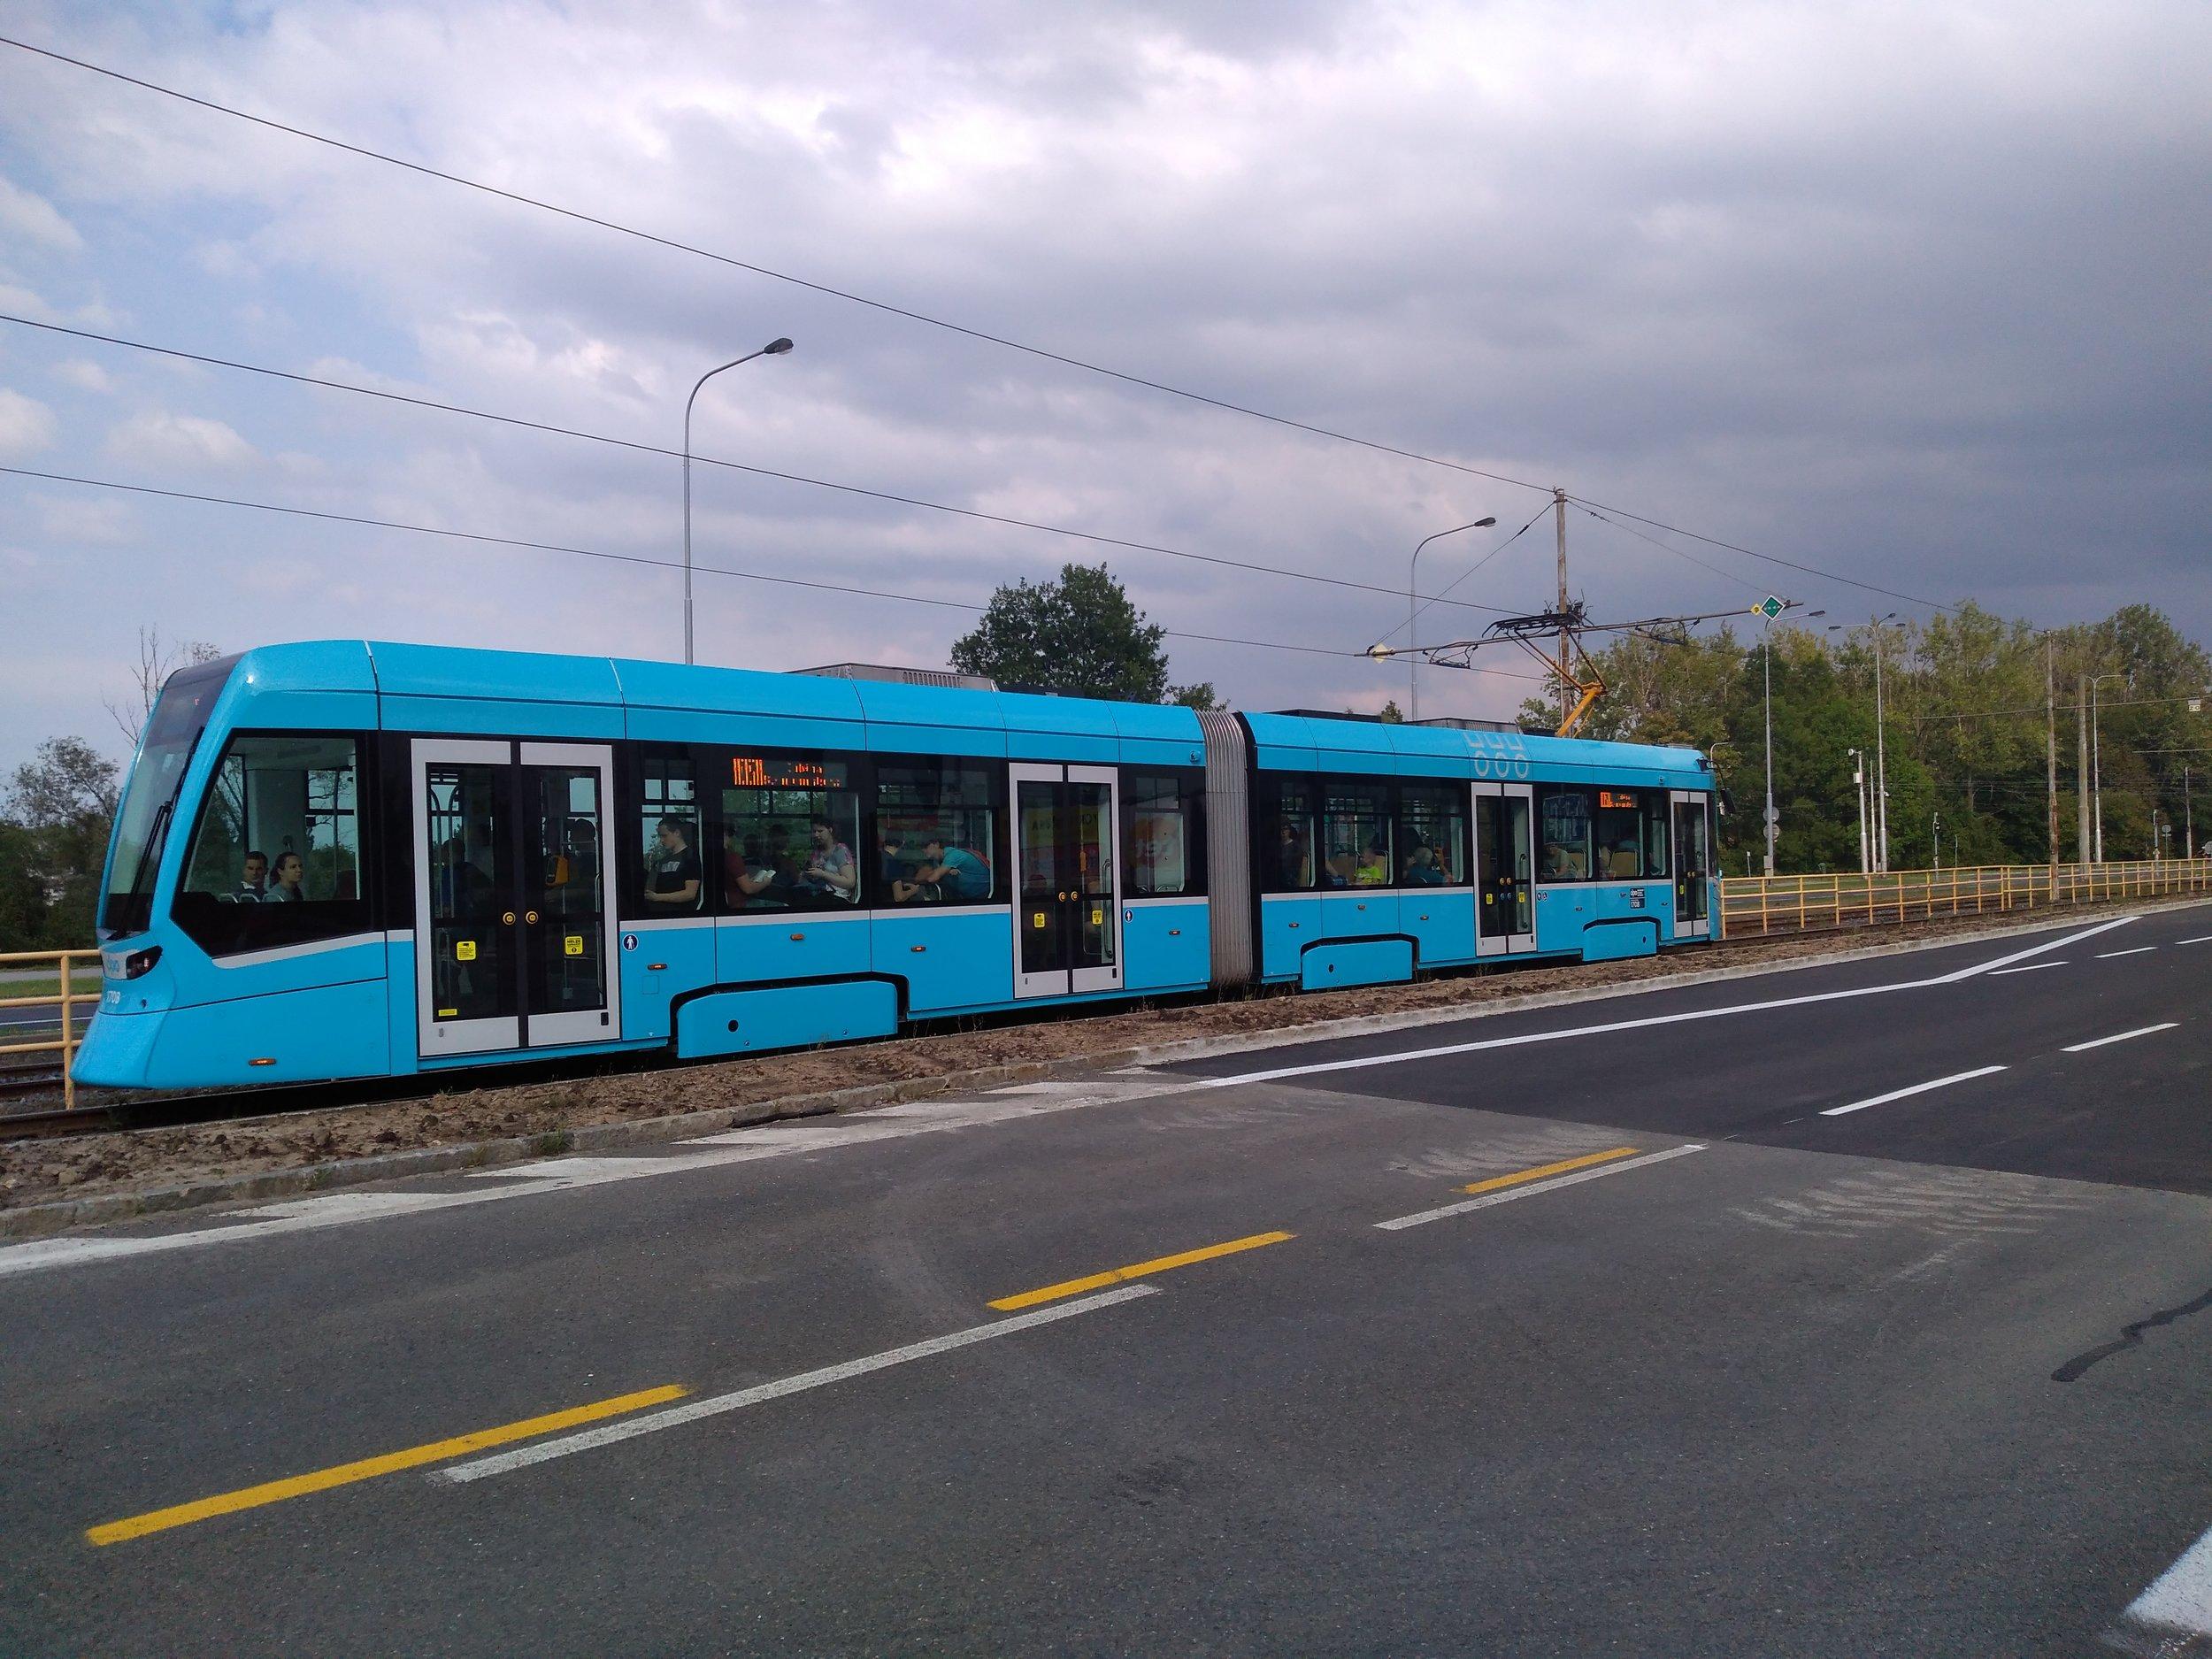 Tramvaj v Porubě dne 12. 8. 2019.